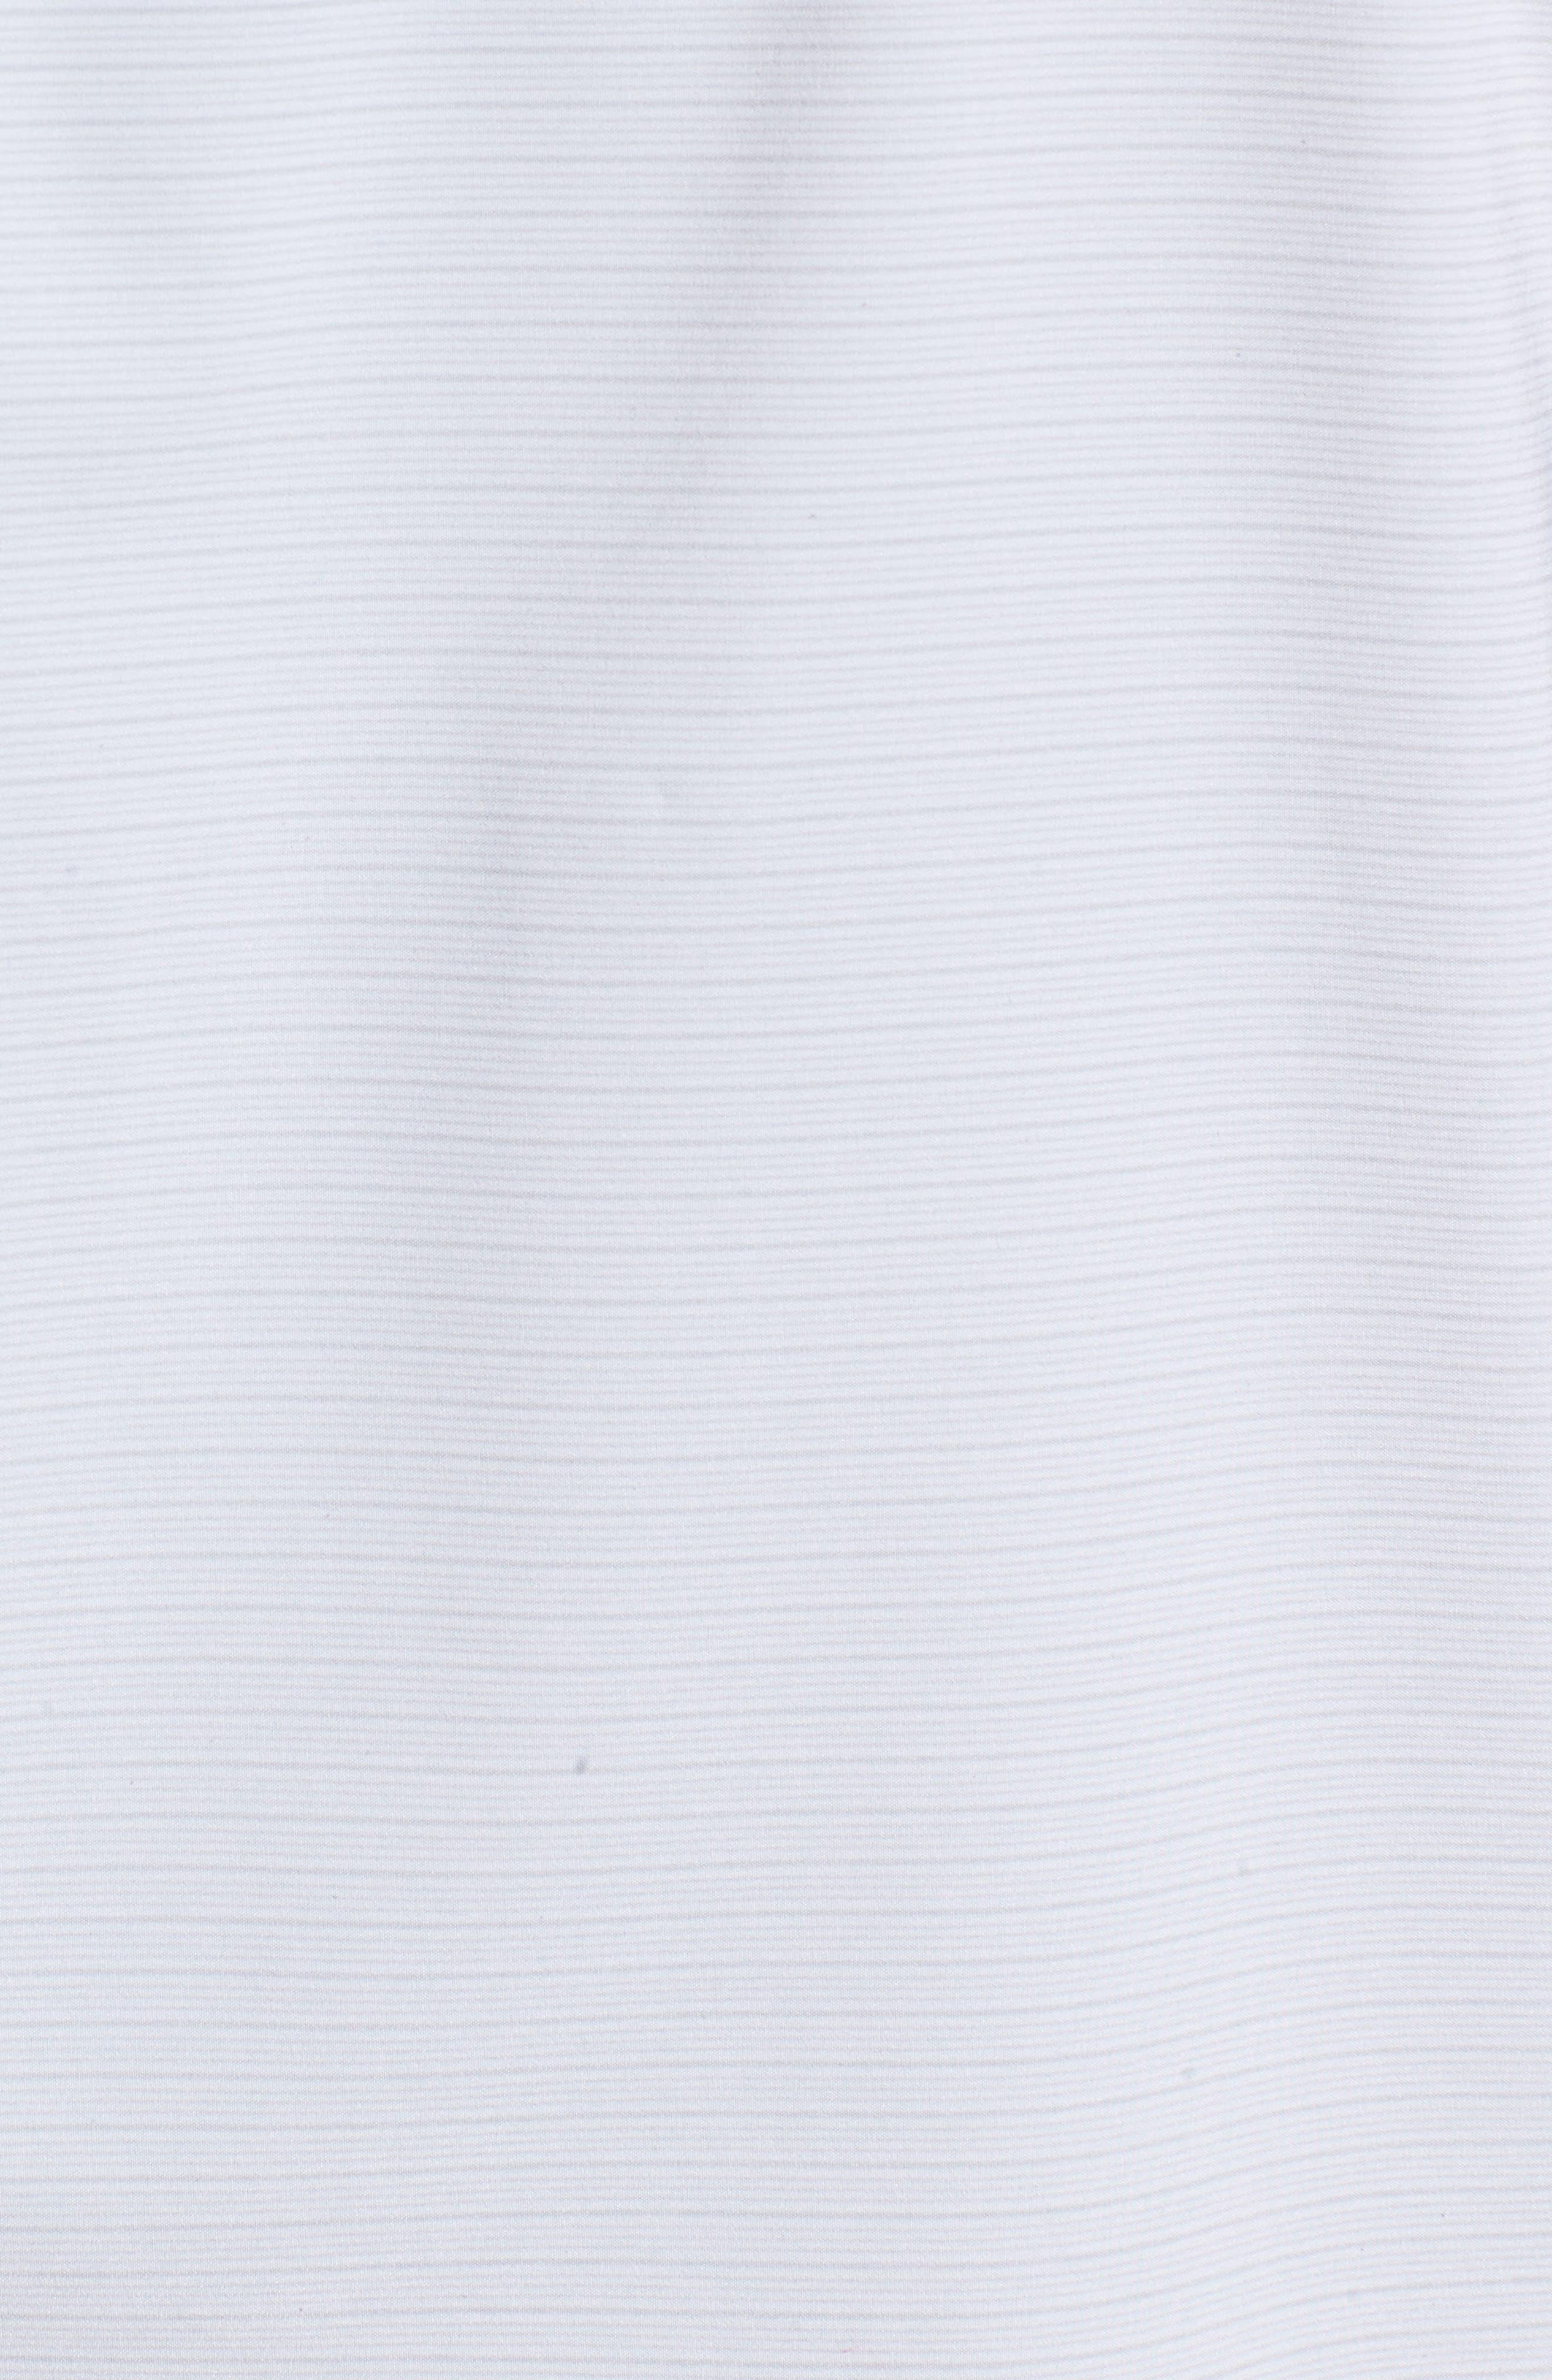 Luca Quarter Zip Pullover,                             Alternate thumbnail 5, color,                             Micro Chip/ White